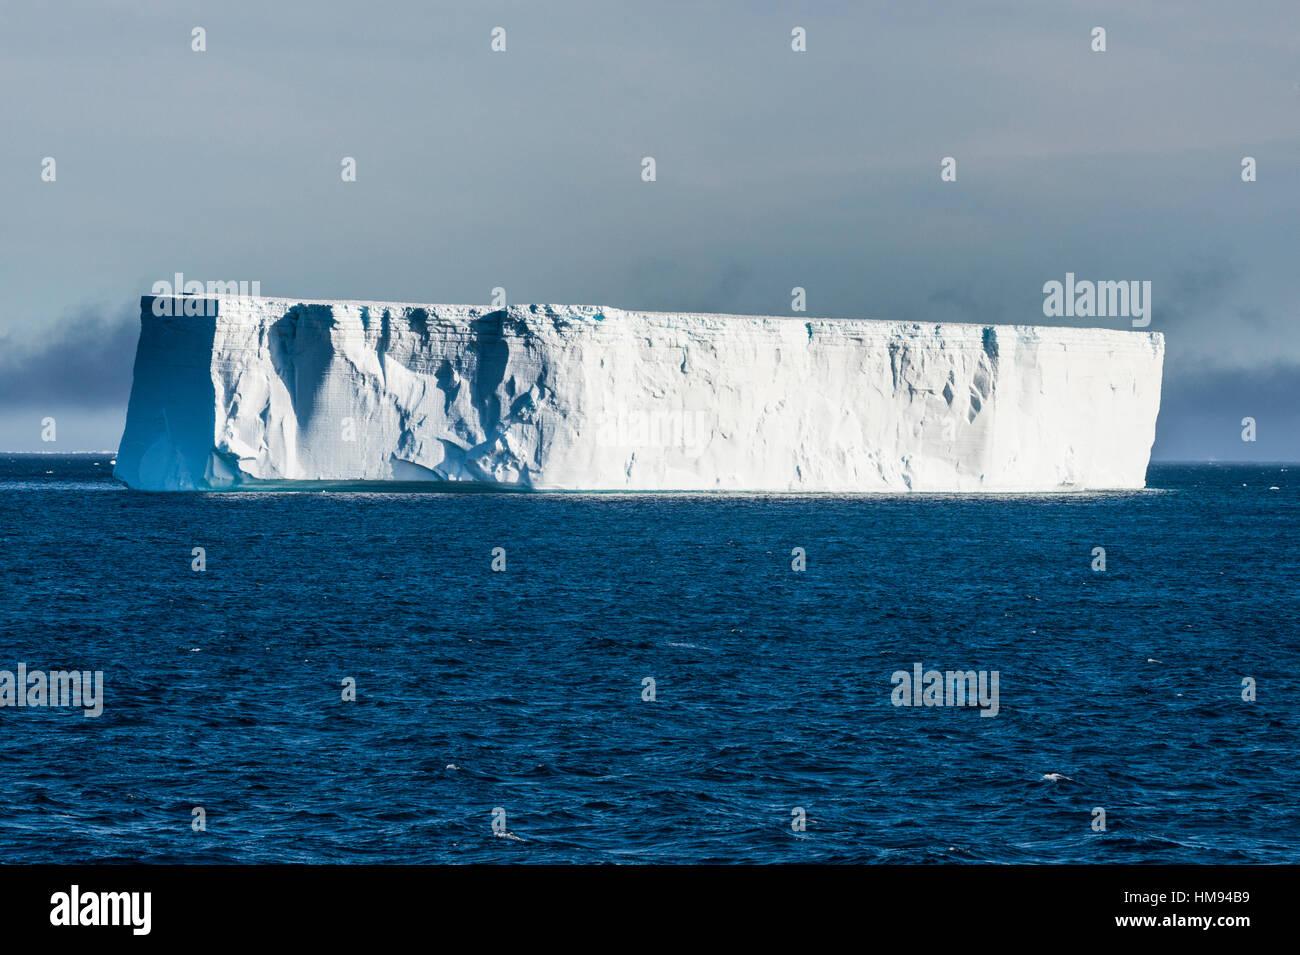 Large iceberg floating in the Weddell Sea, Antarctica, Polar Regions - Stock Image